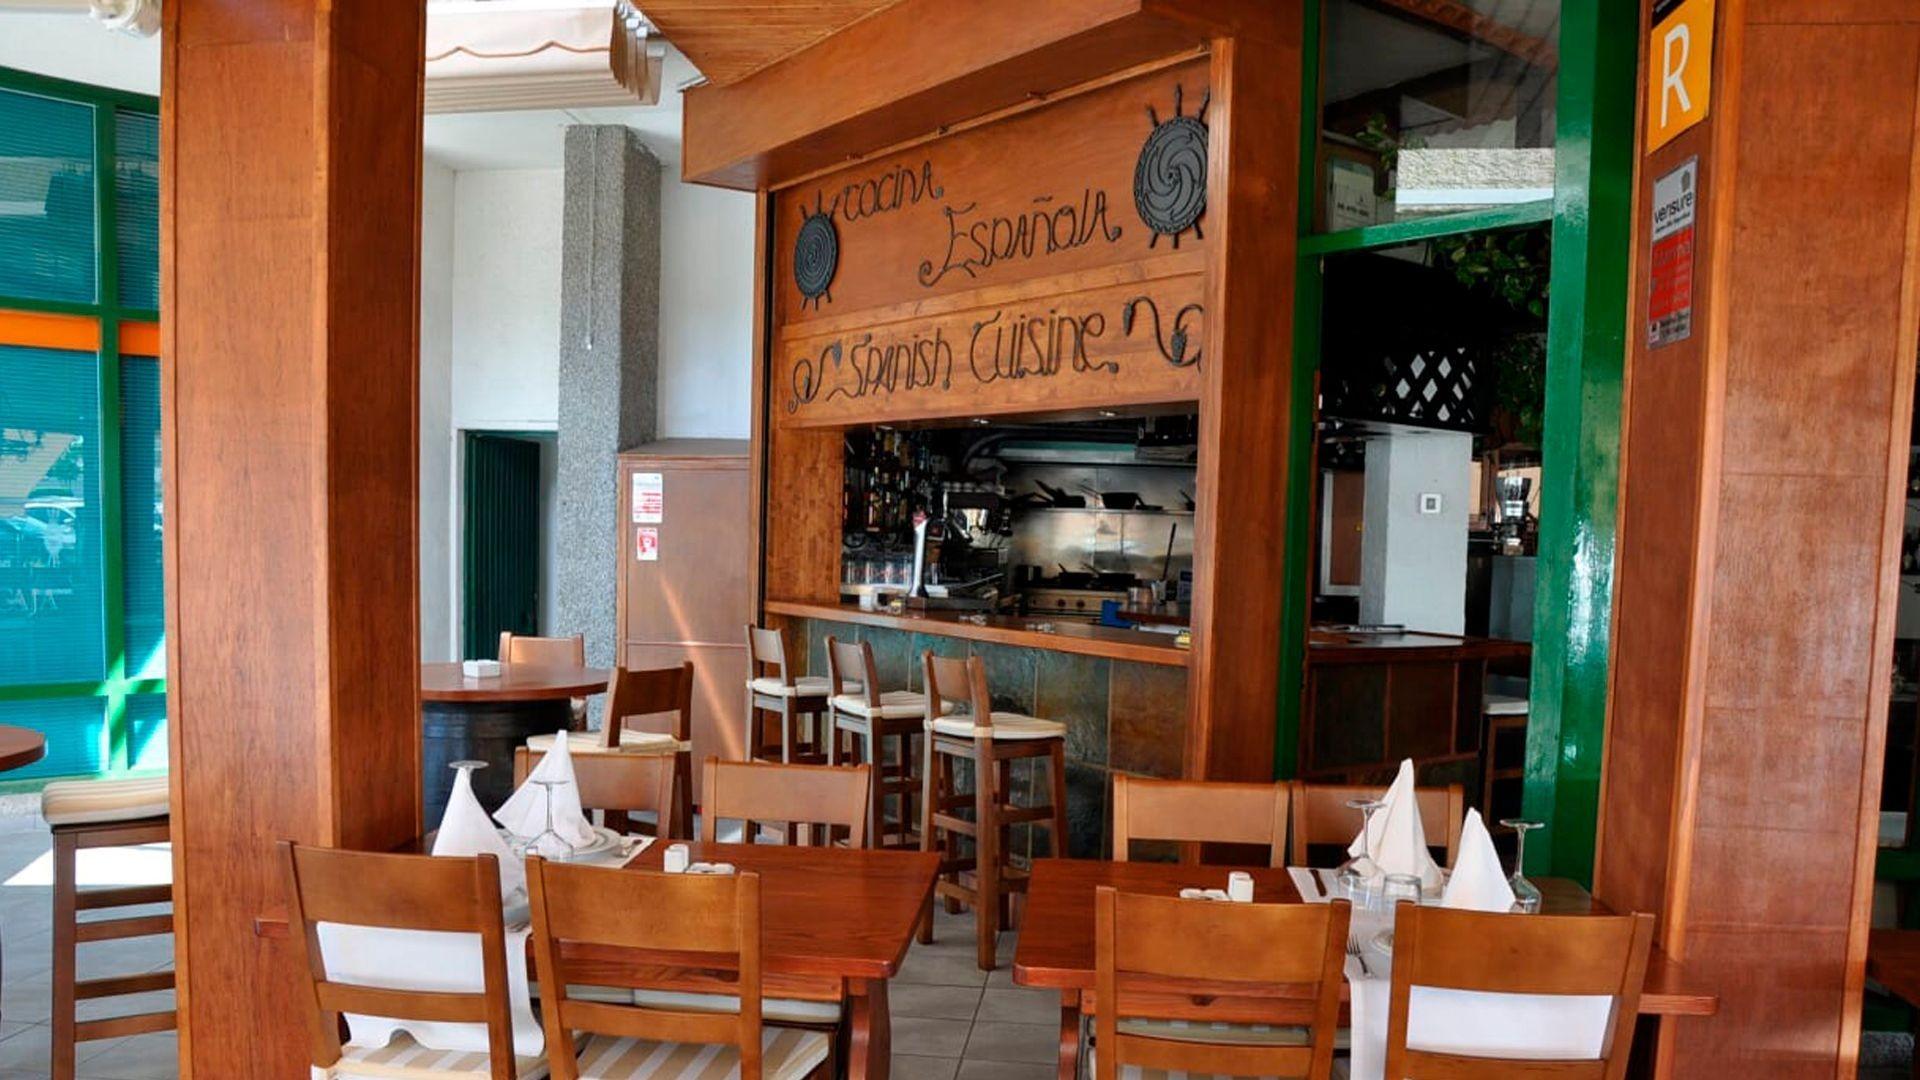 Restaurante de comida española en Arona